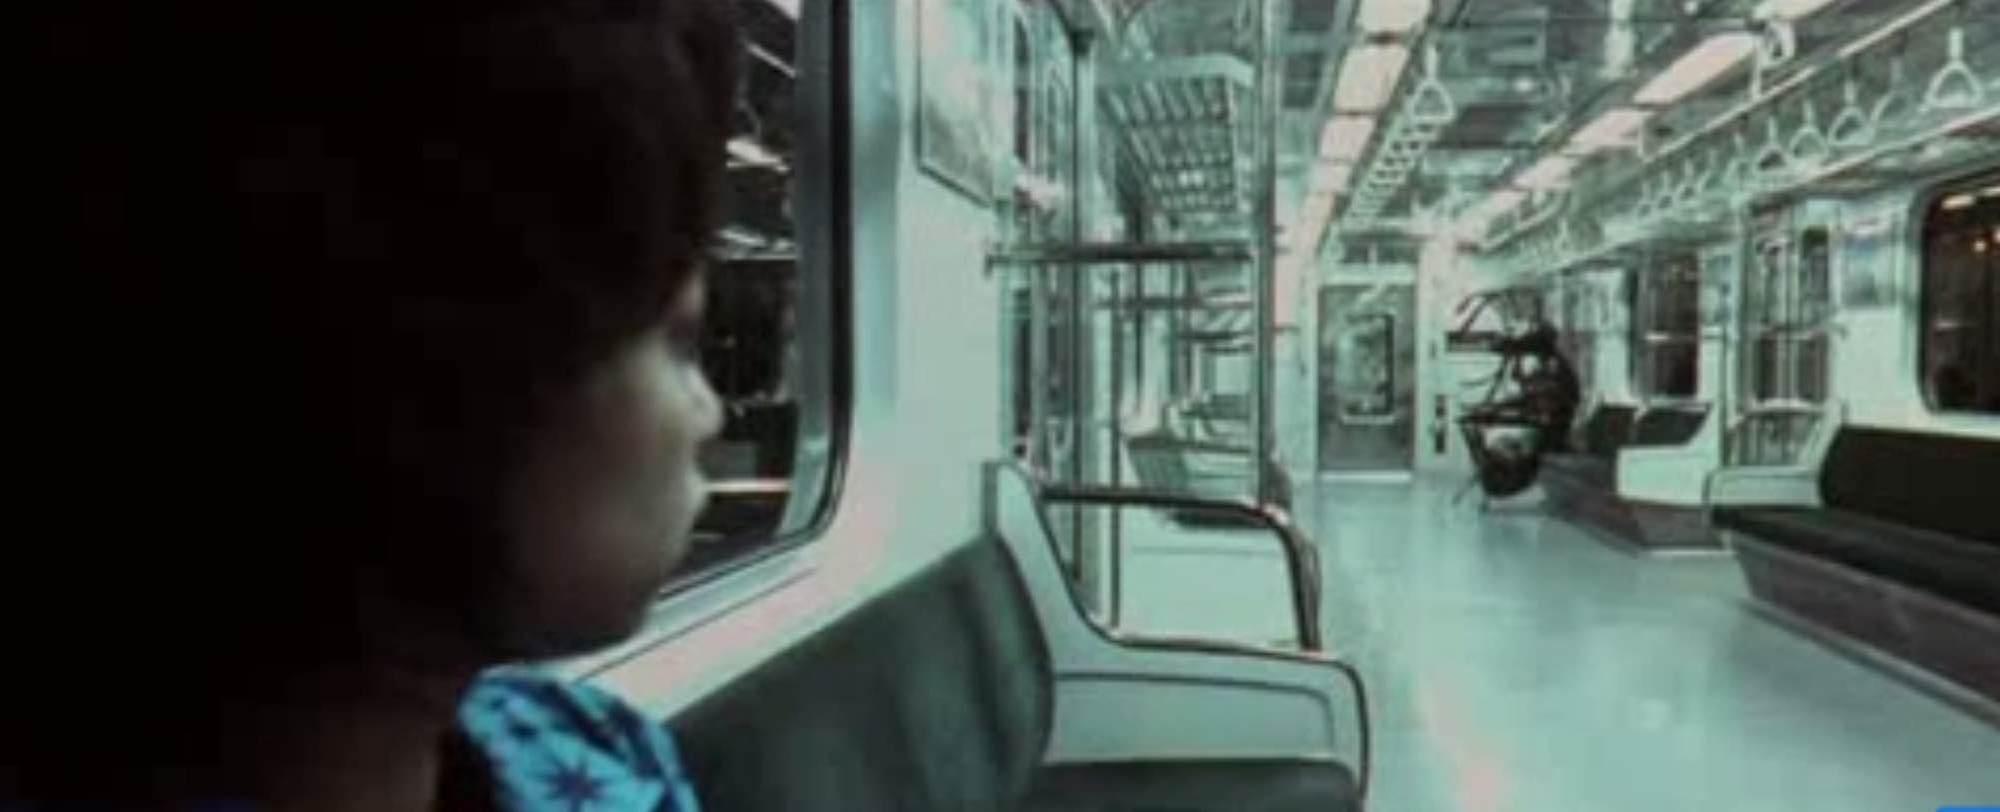 Mi-do on subway train